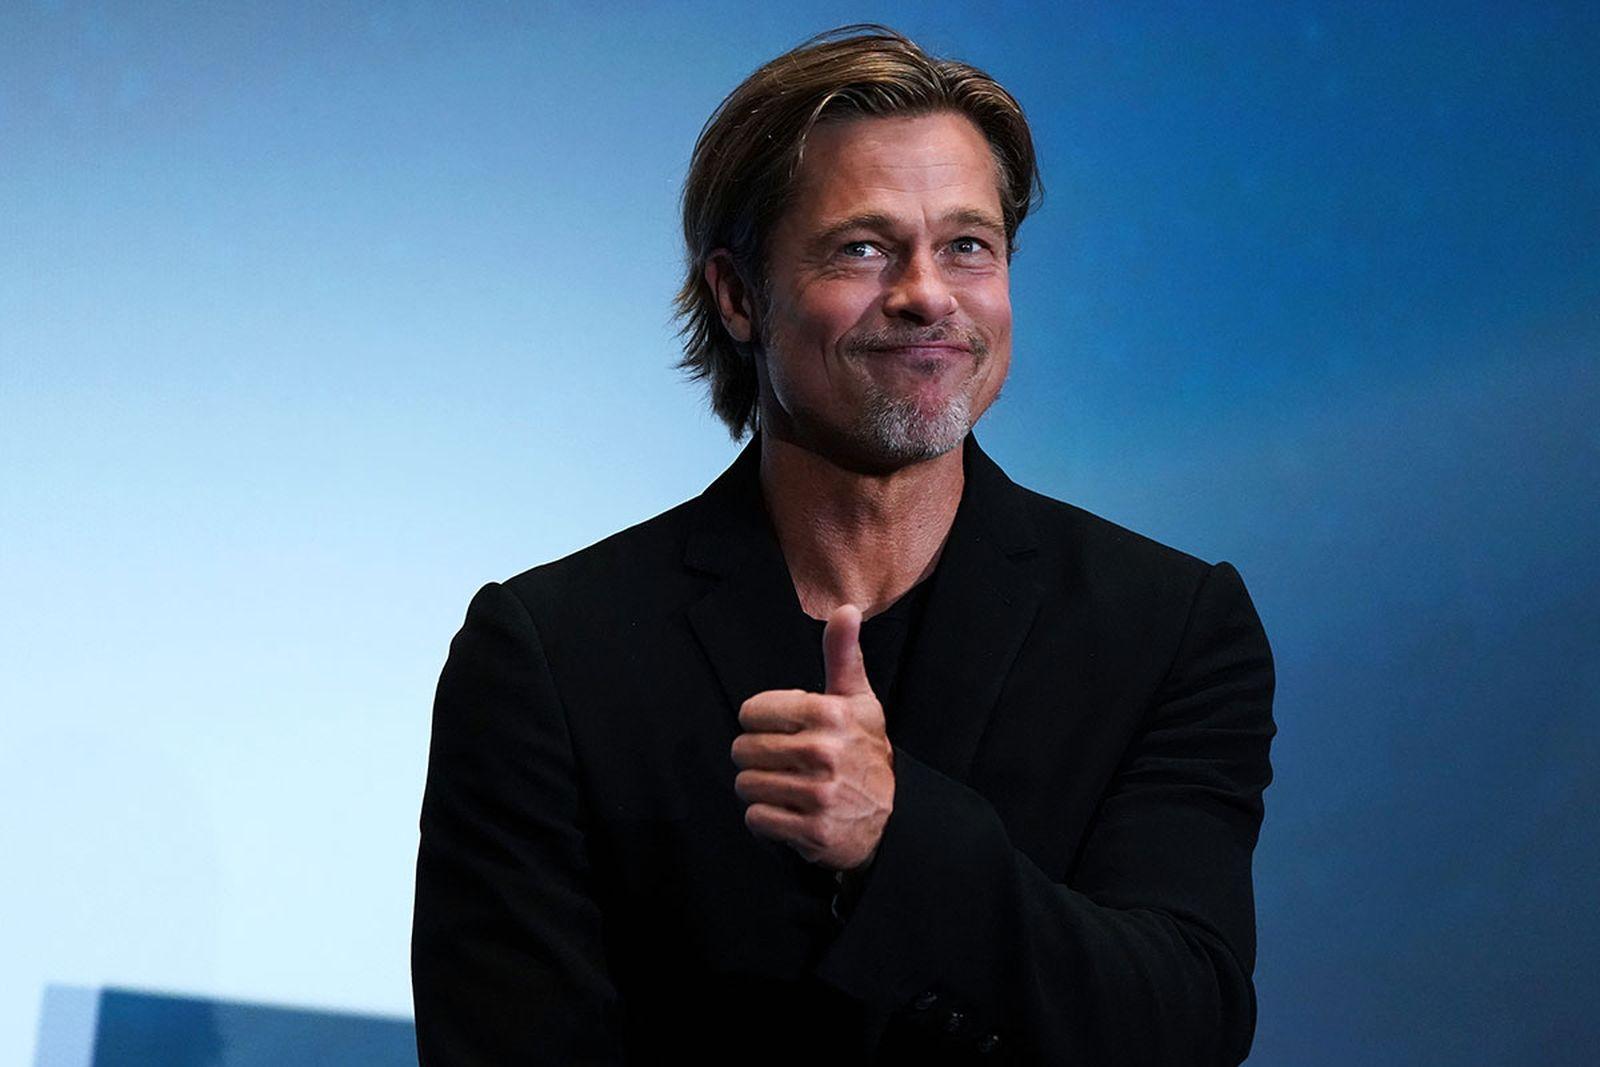 Brad Pitt thumbs up